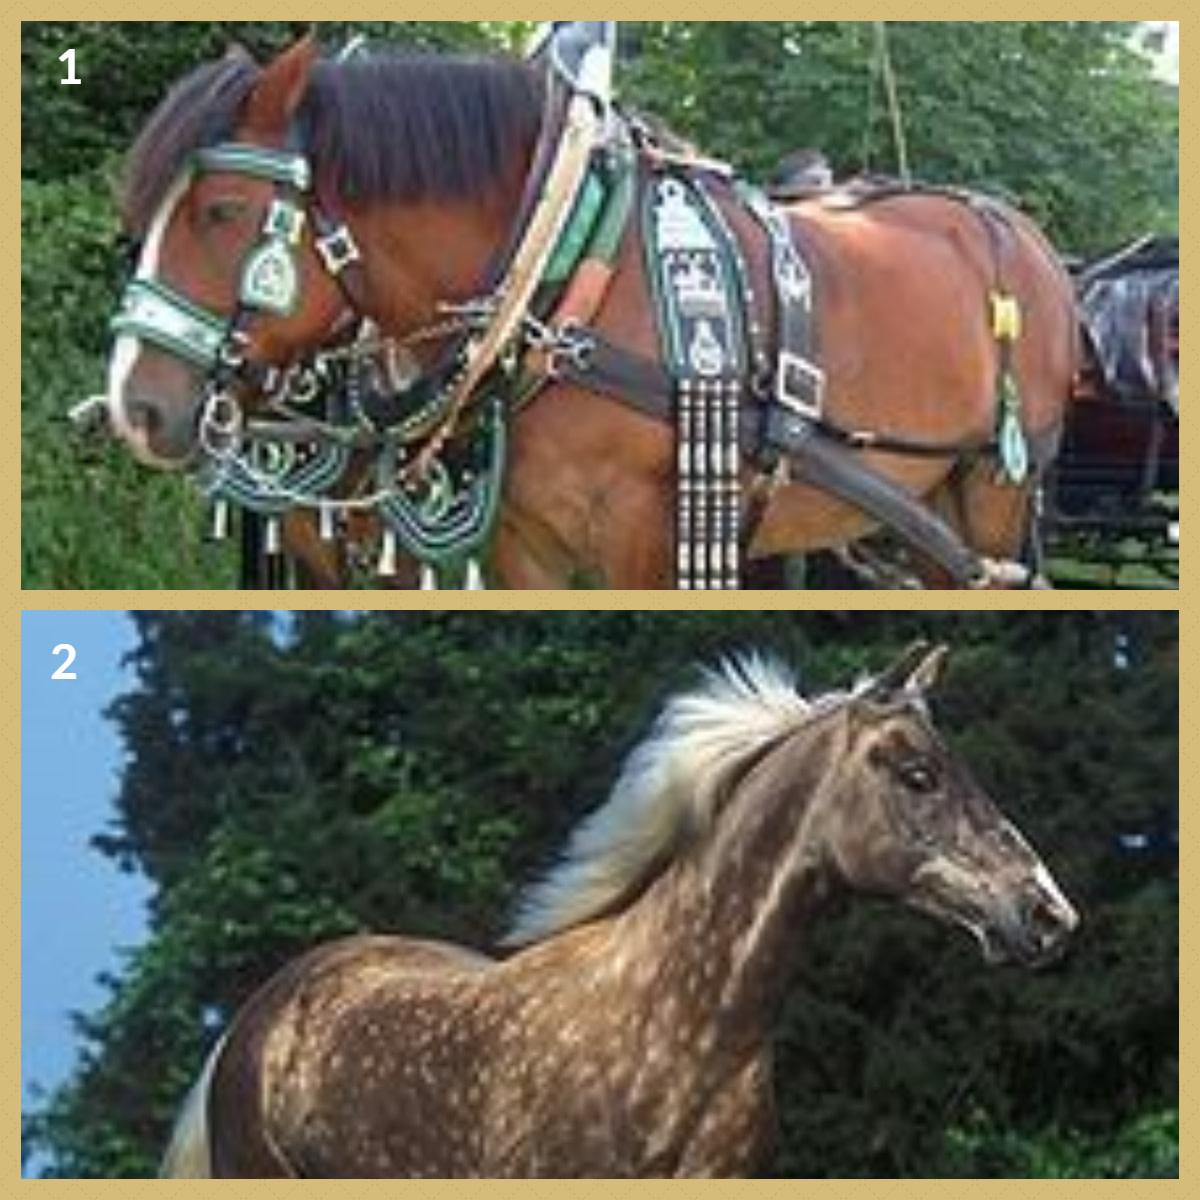 1.  Rhenish Draft Horse 2.  Rocky Mountain Horse